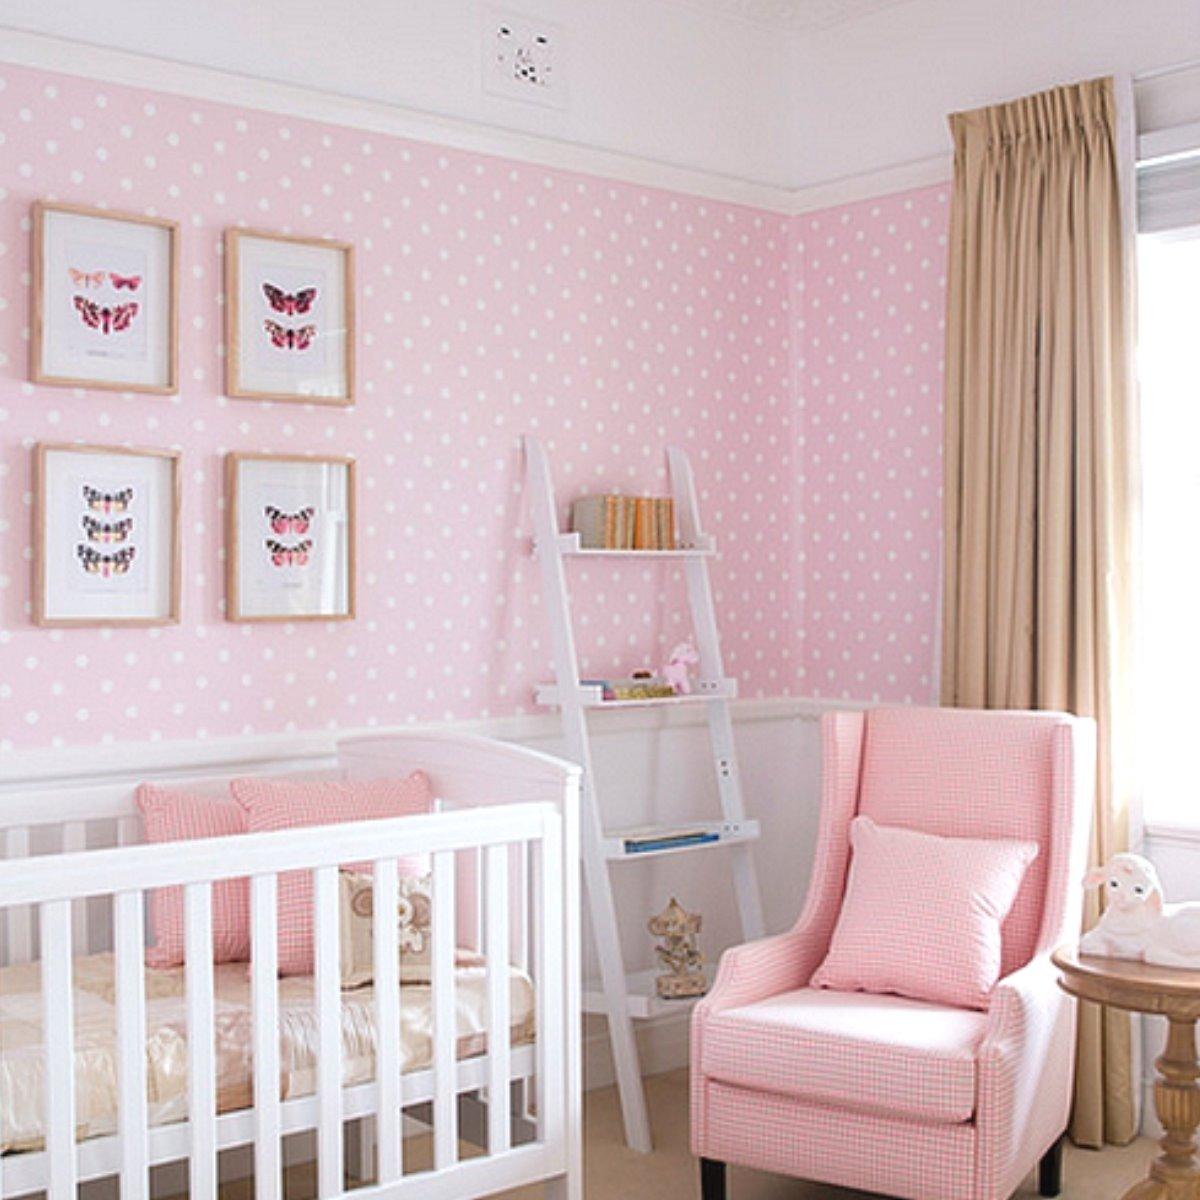 Papel de parede rosa adesivo vinil infantil beb menina po r 48 90 em mercado livre - Papel de pared bebe ...